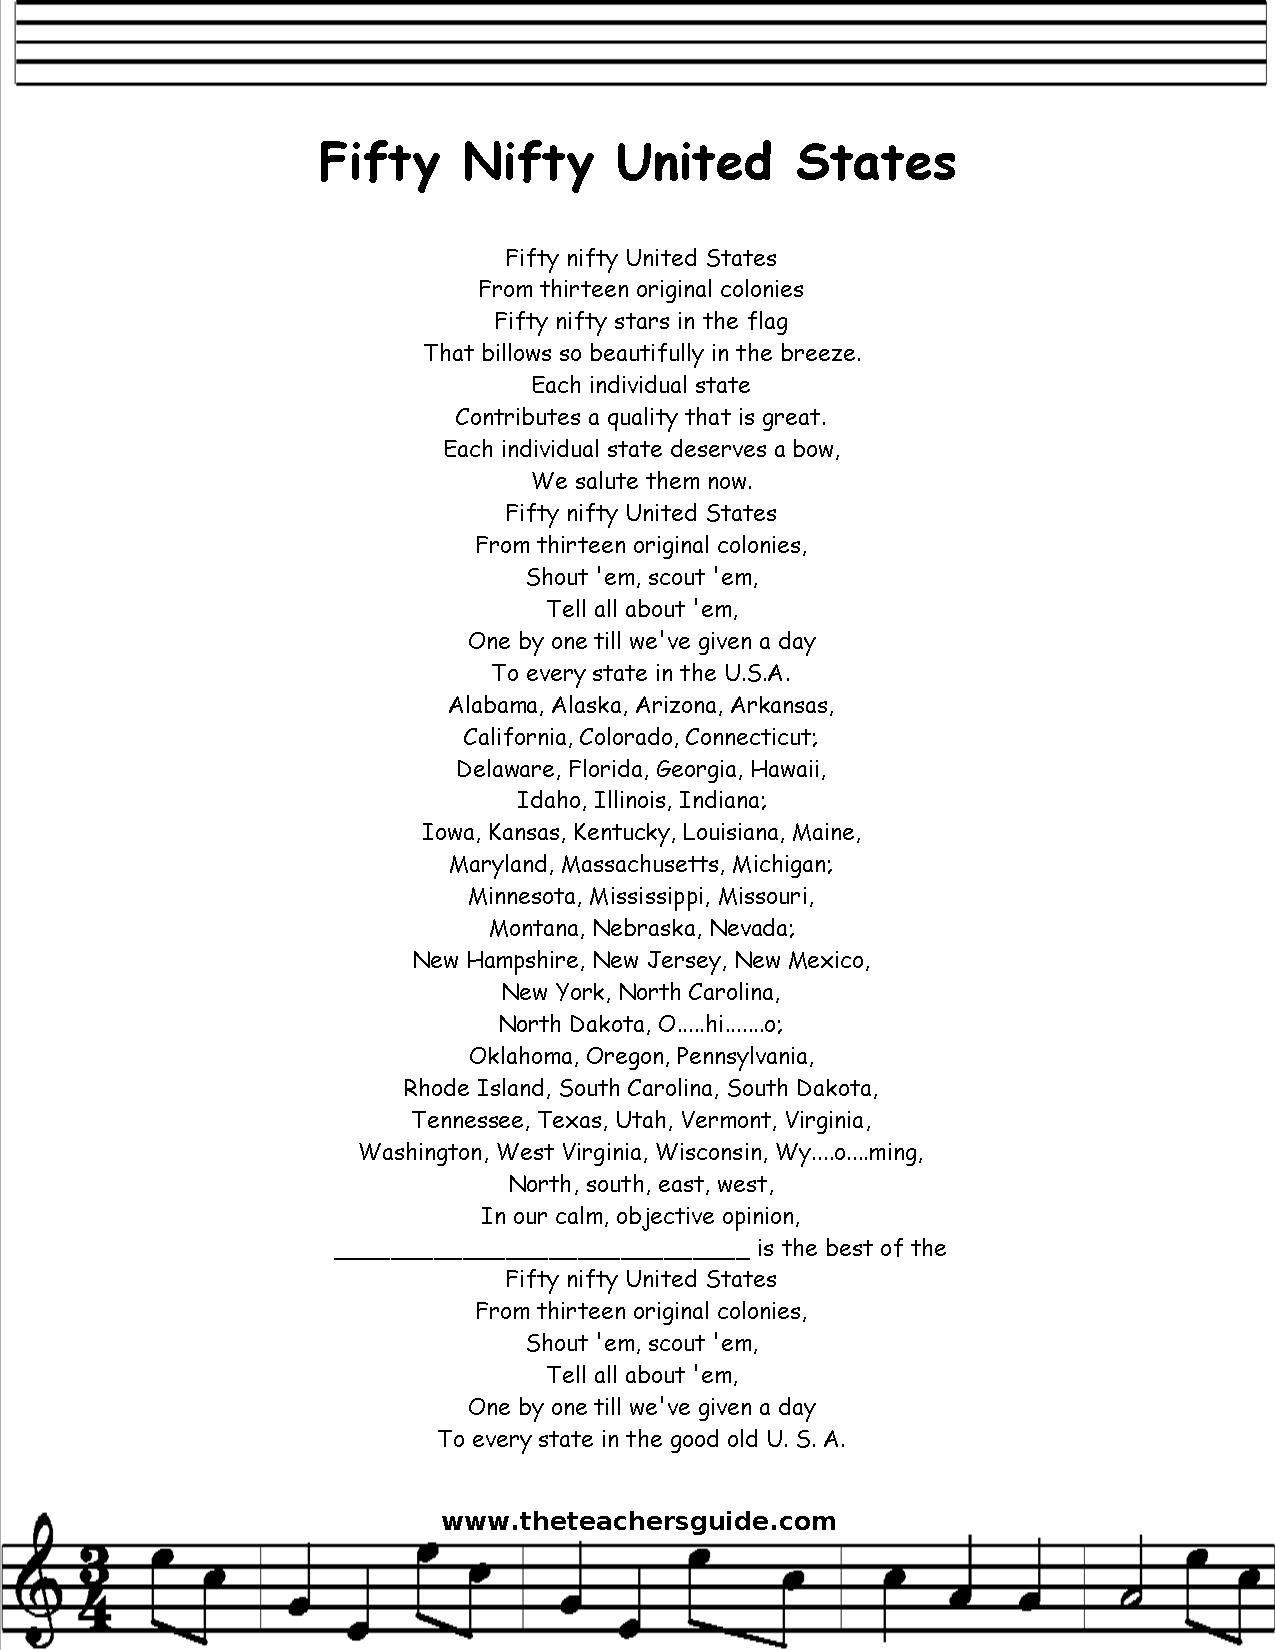 50 nifty united states lyrics Google Search Science